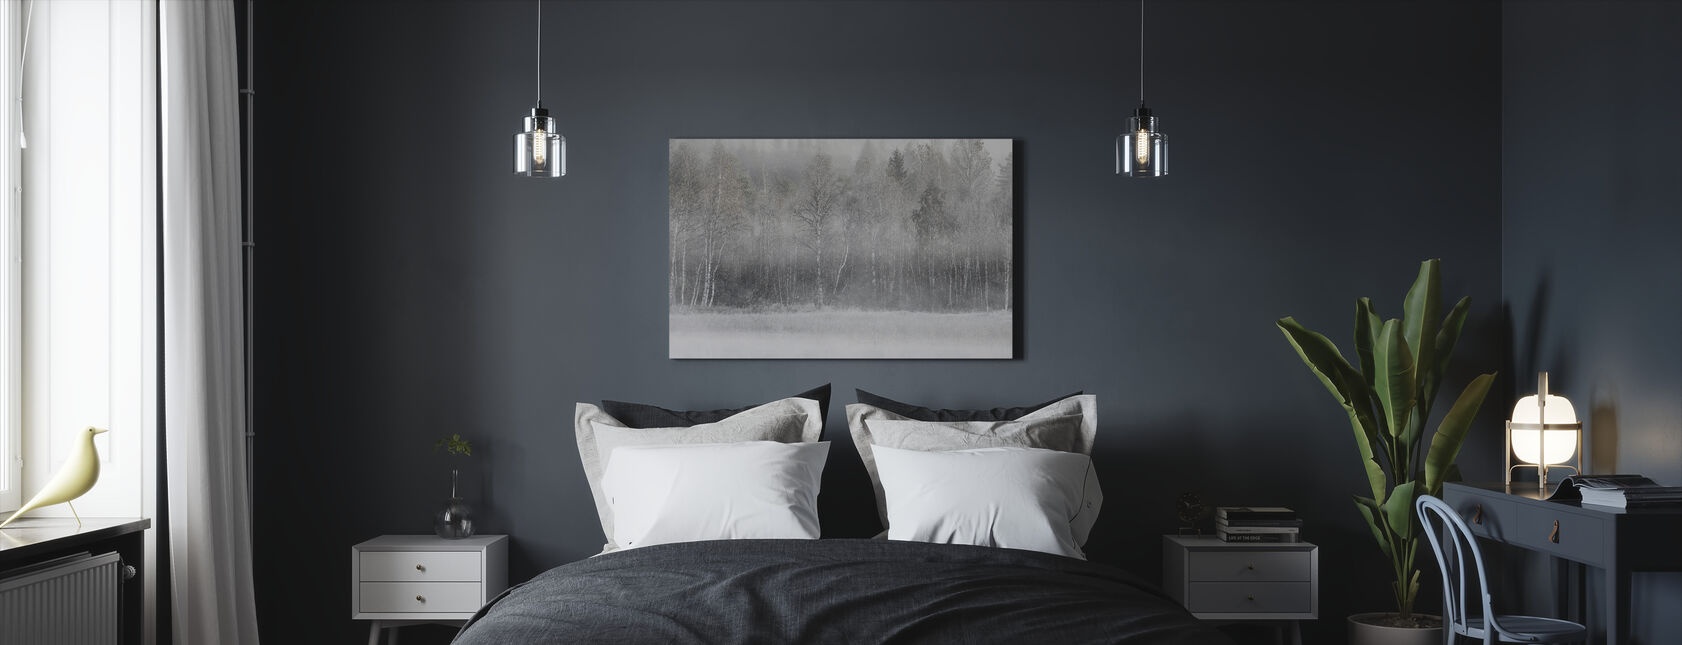 Mysterie bomen - Canvas print - Slaapkamer